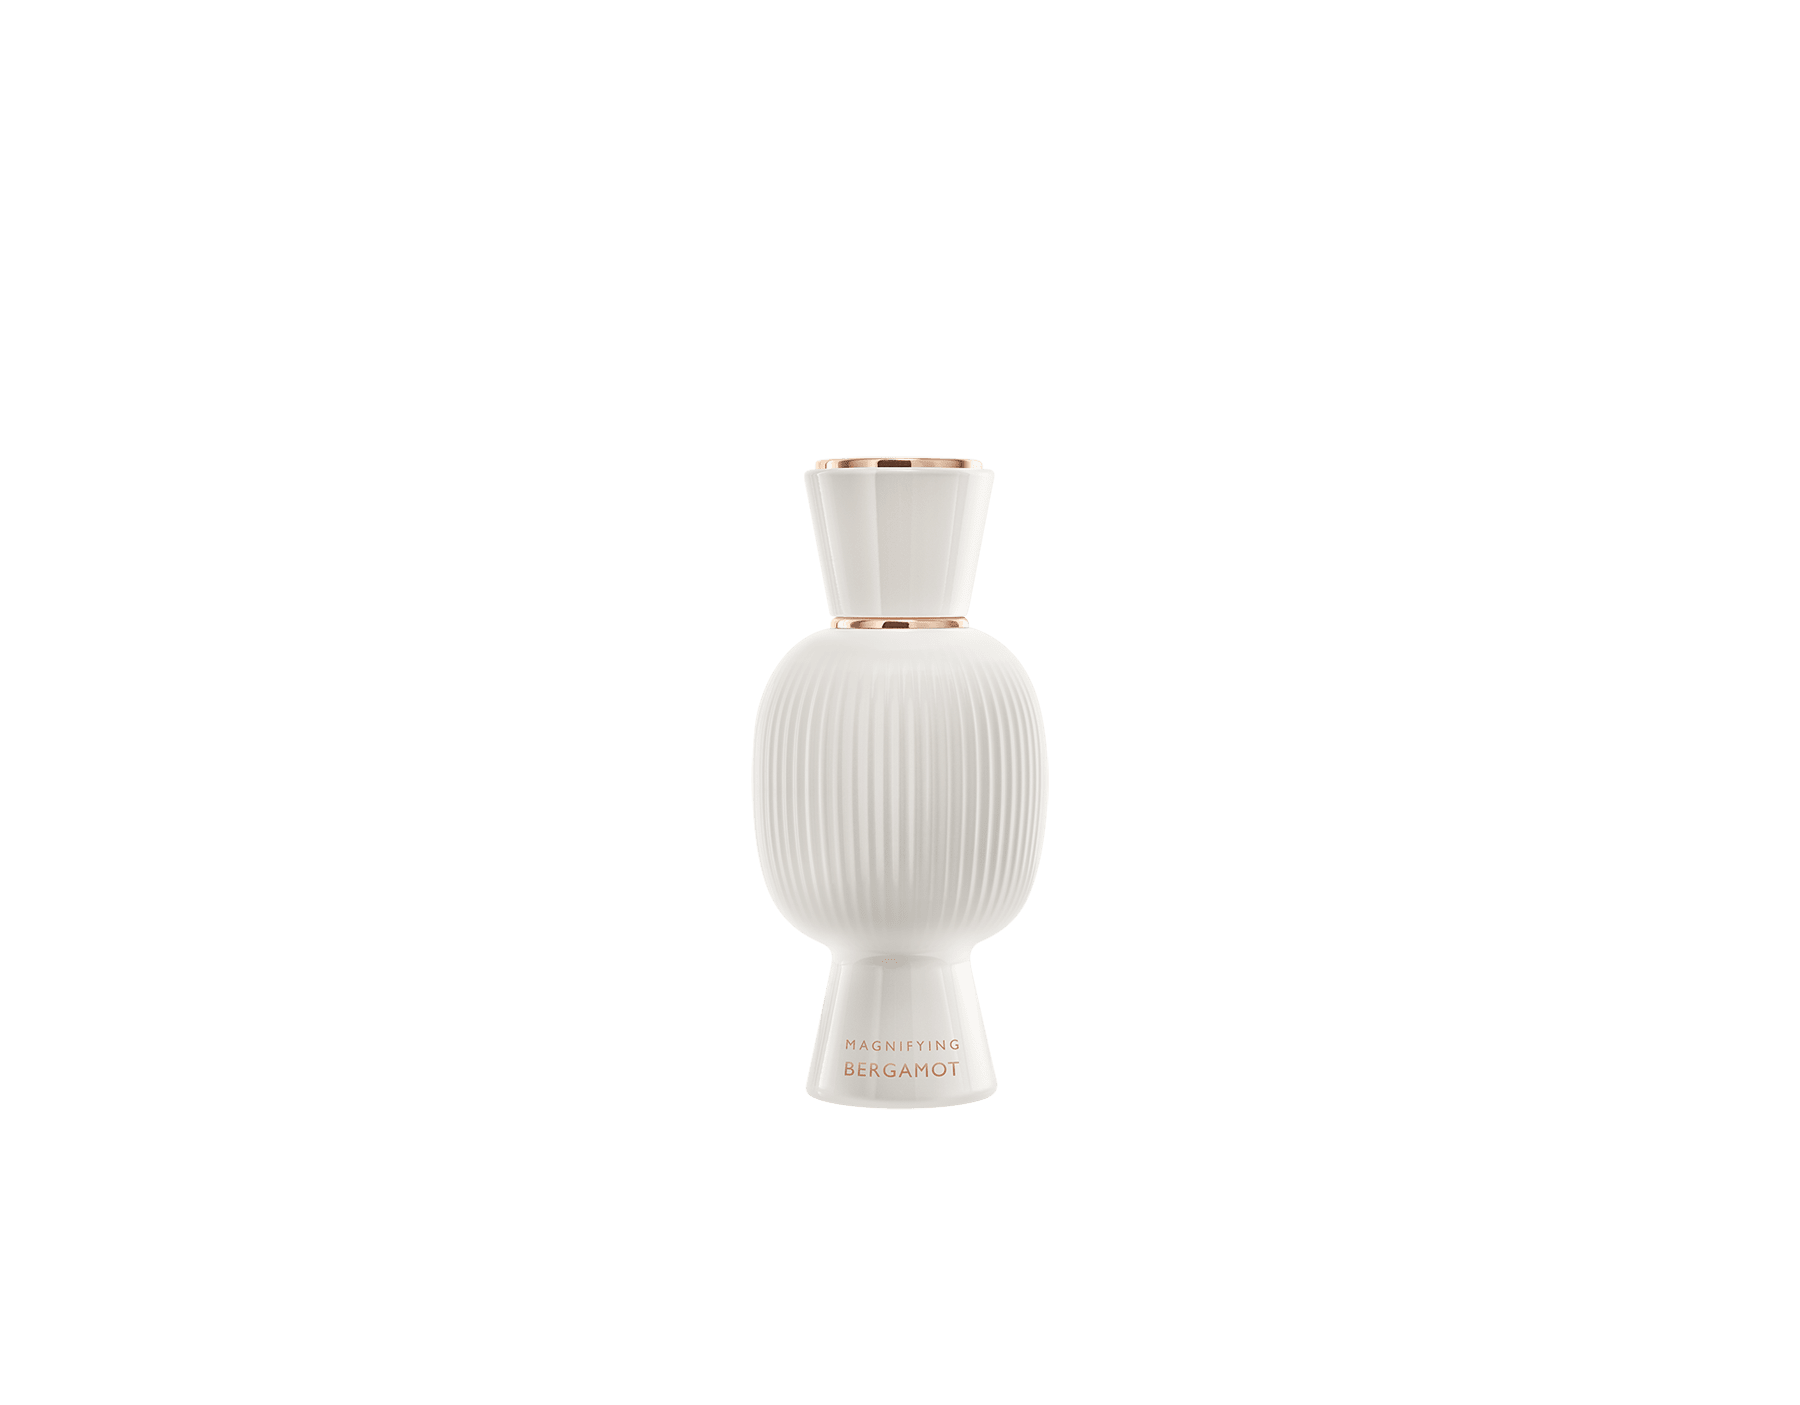 The energising Magnifying Bergamot elevates the freshness of your Eau de Parfum. #MagnifyForMore Joy 41277 image 6